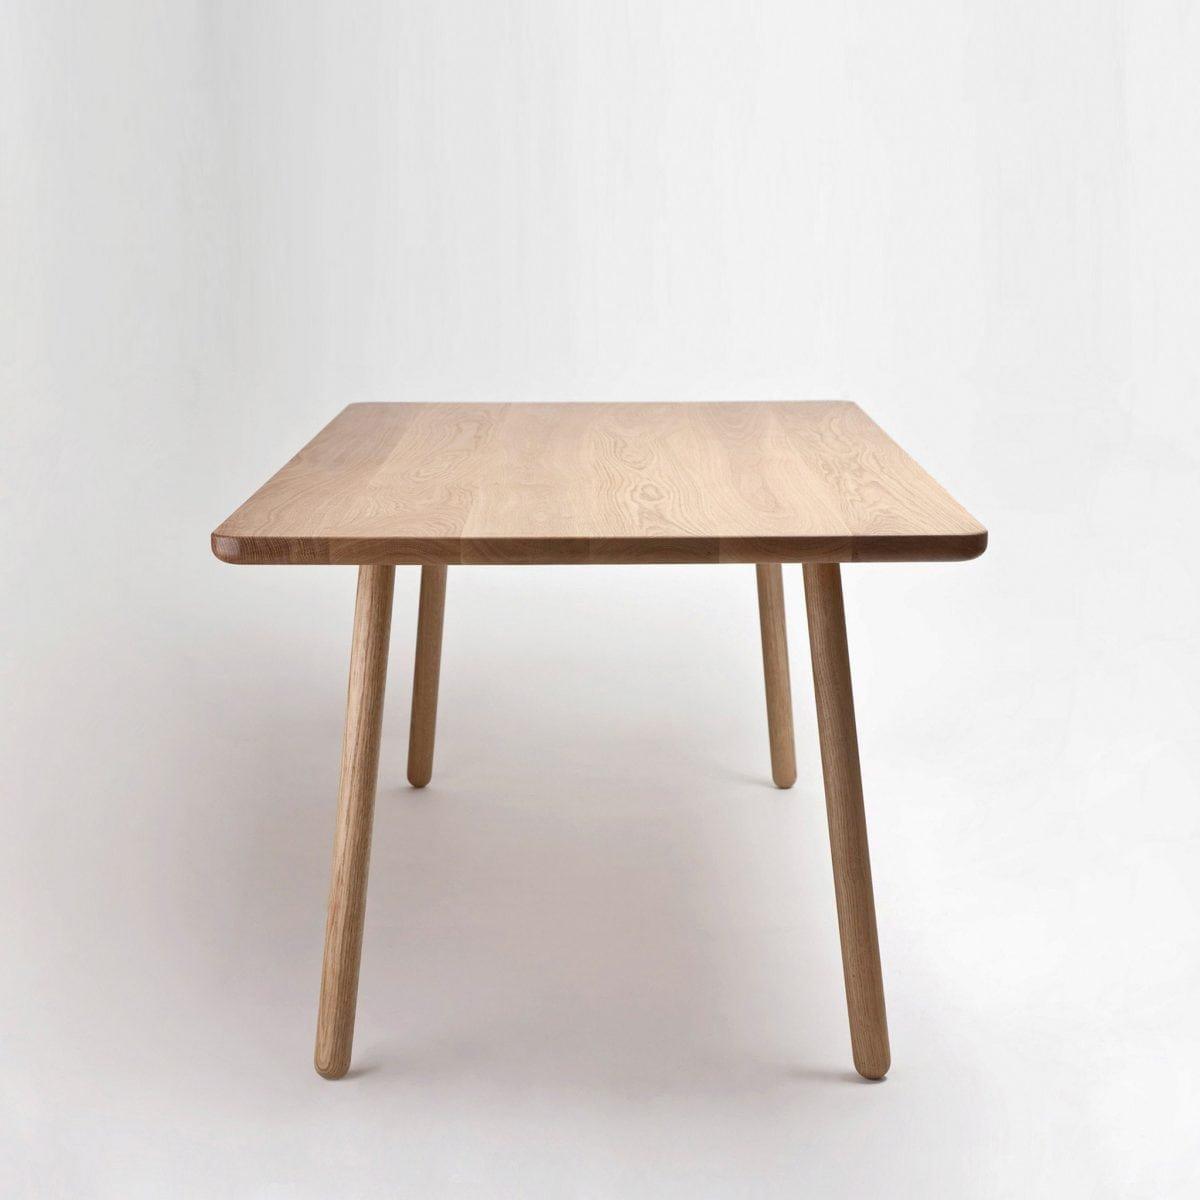 tr s grande table de salle manger one en ch ne naturel par another country en vente sur pamono. Black Bedroom Furniture Sets. Home Design Ideas